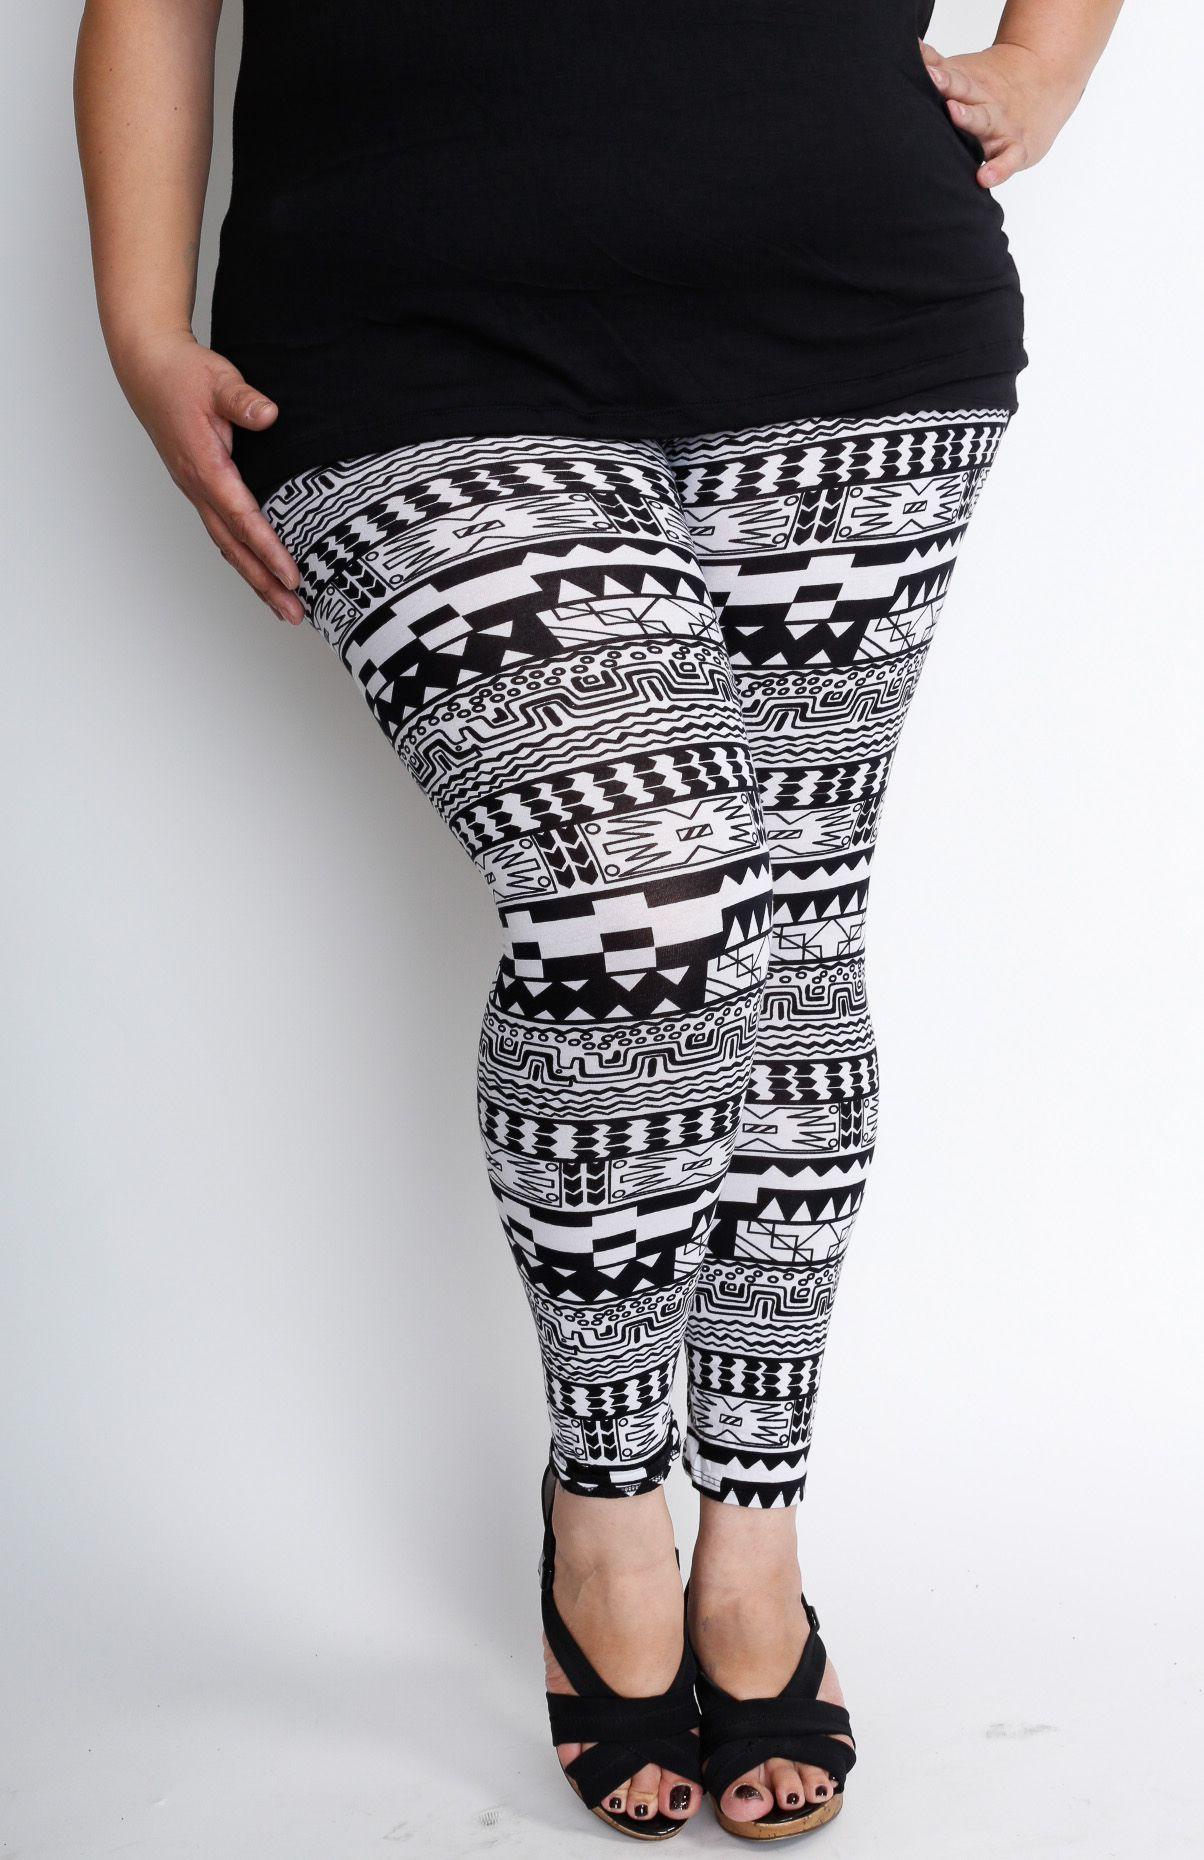 911834272 Pretty Plus Size leggings At Wholesale Prices.  plussize  wholesale   clothing  leggings  curvy  plus  size  fashion